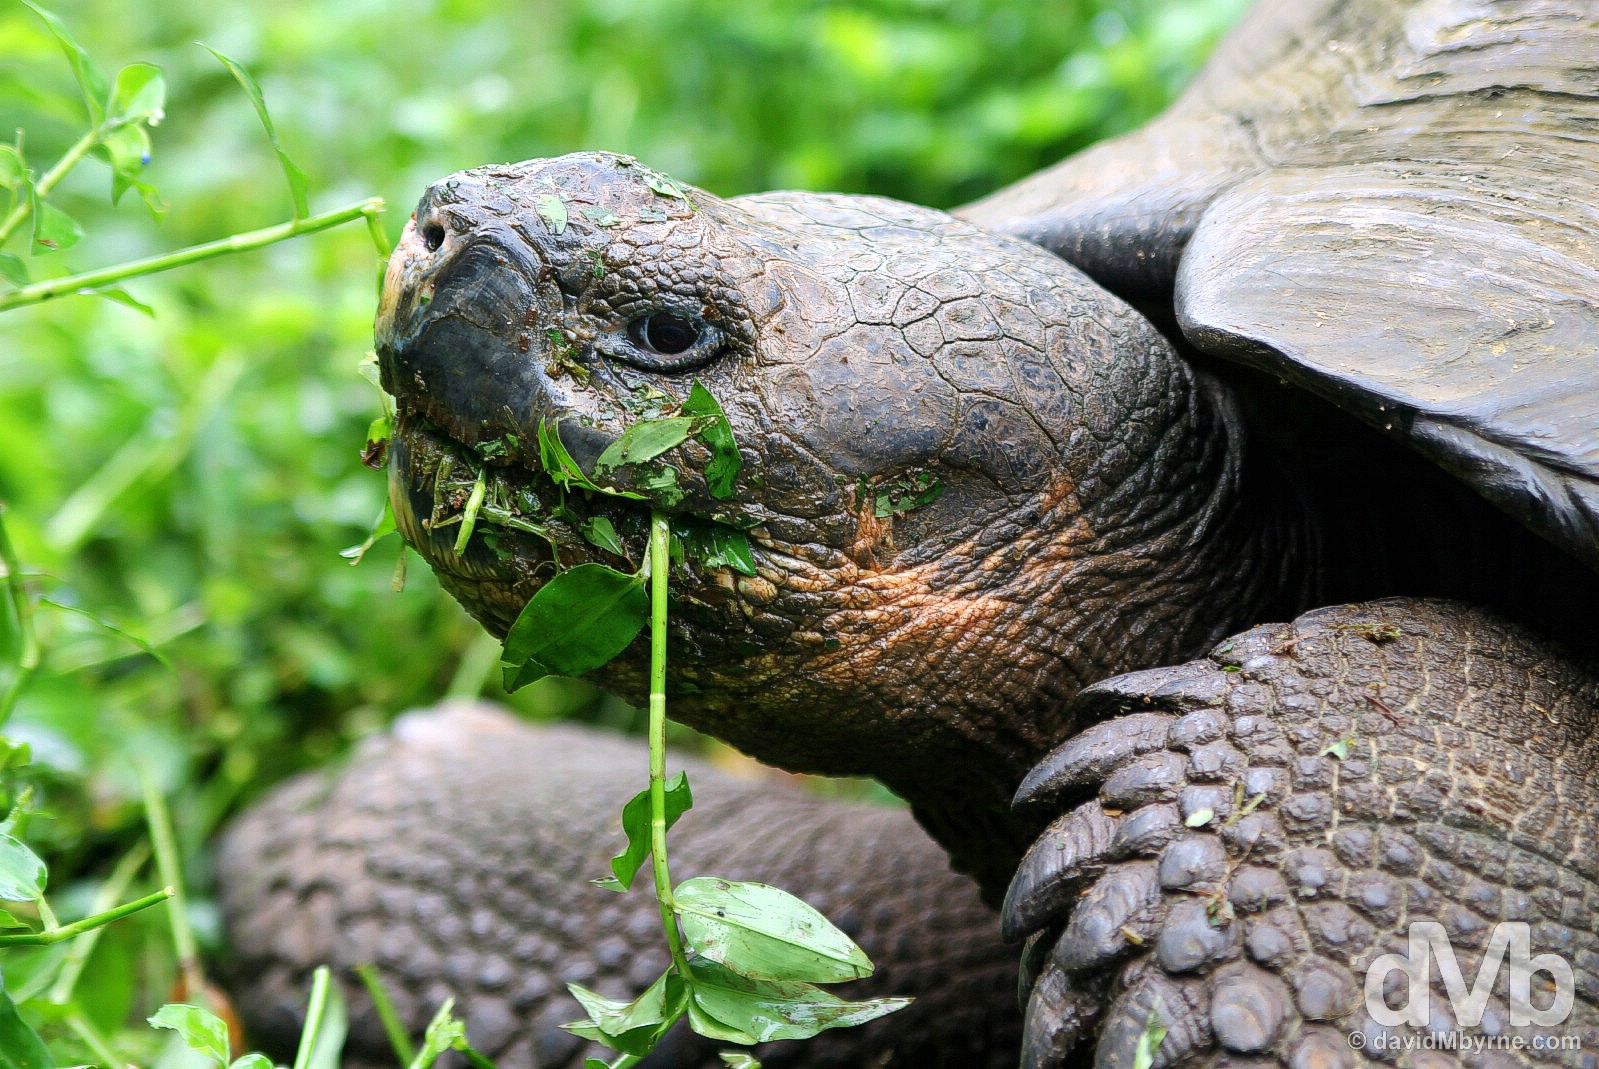 A Giant Tortoise feeding at Rancho Primicias, Isla Santa Cruz, Galapagos, Ecuador. July 17, 2015.